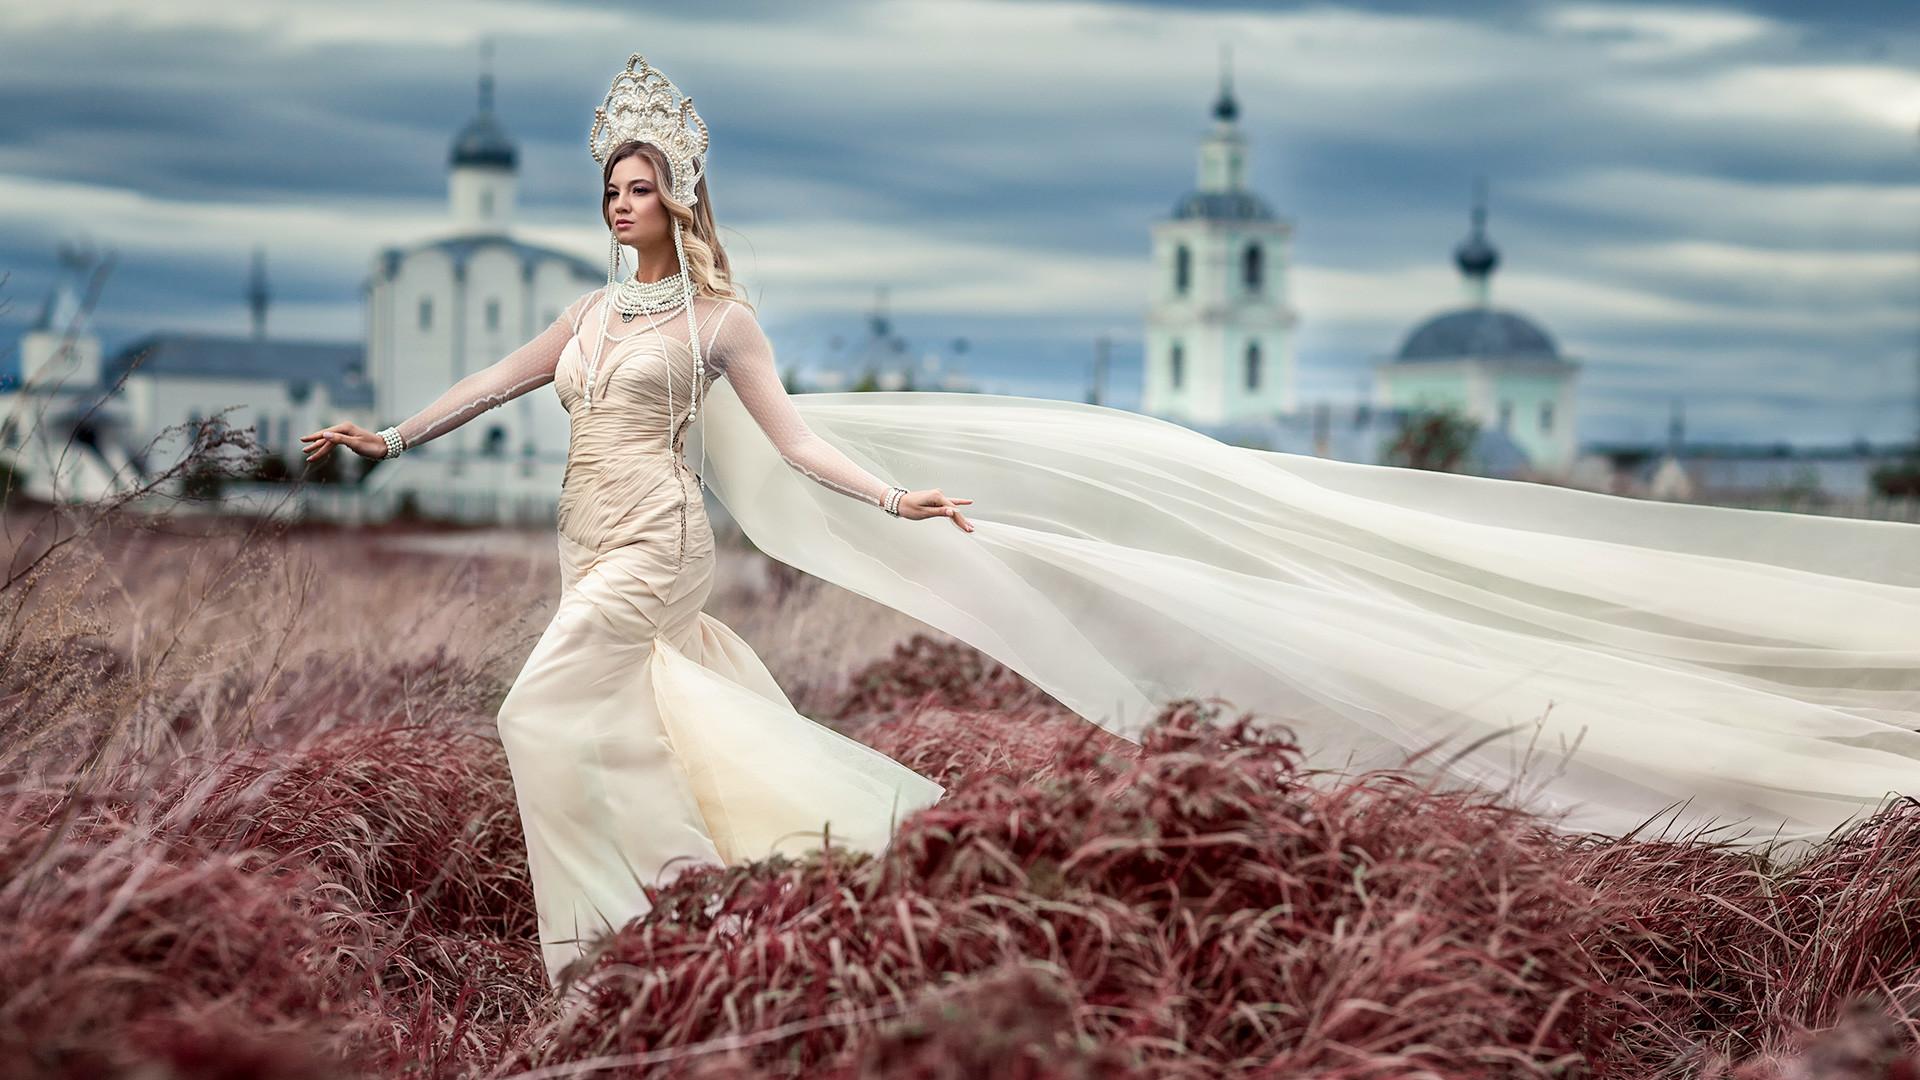 Femme russe robe courte